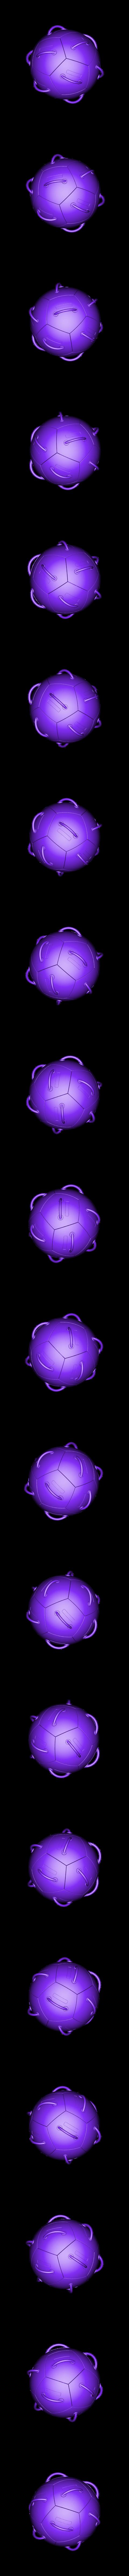 Drawer Organizer.stl Download STL file Spherical Drawer Organizer  • 3D printing object, SE_2018